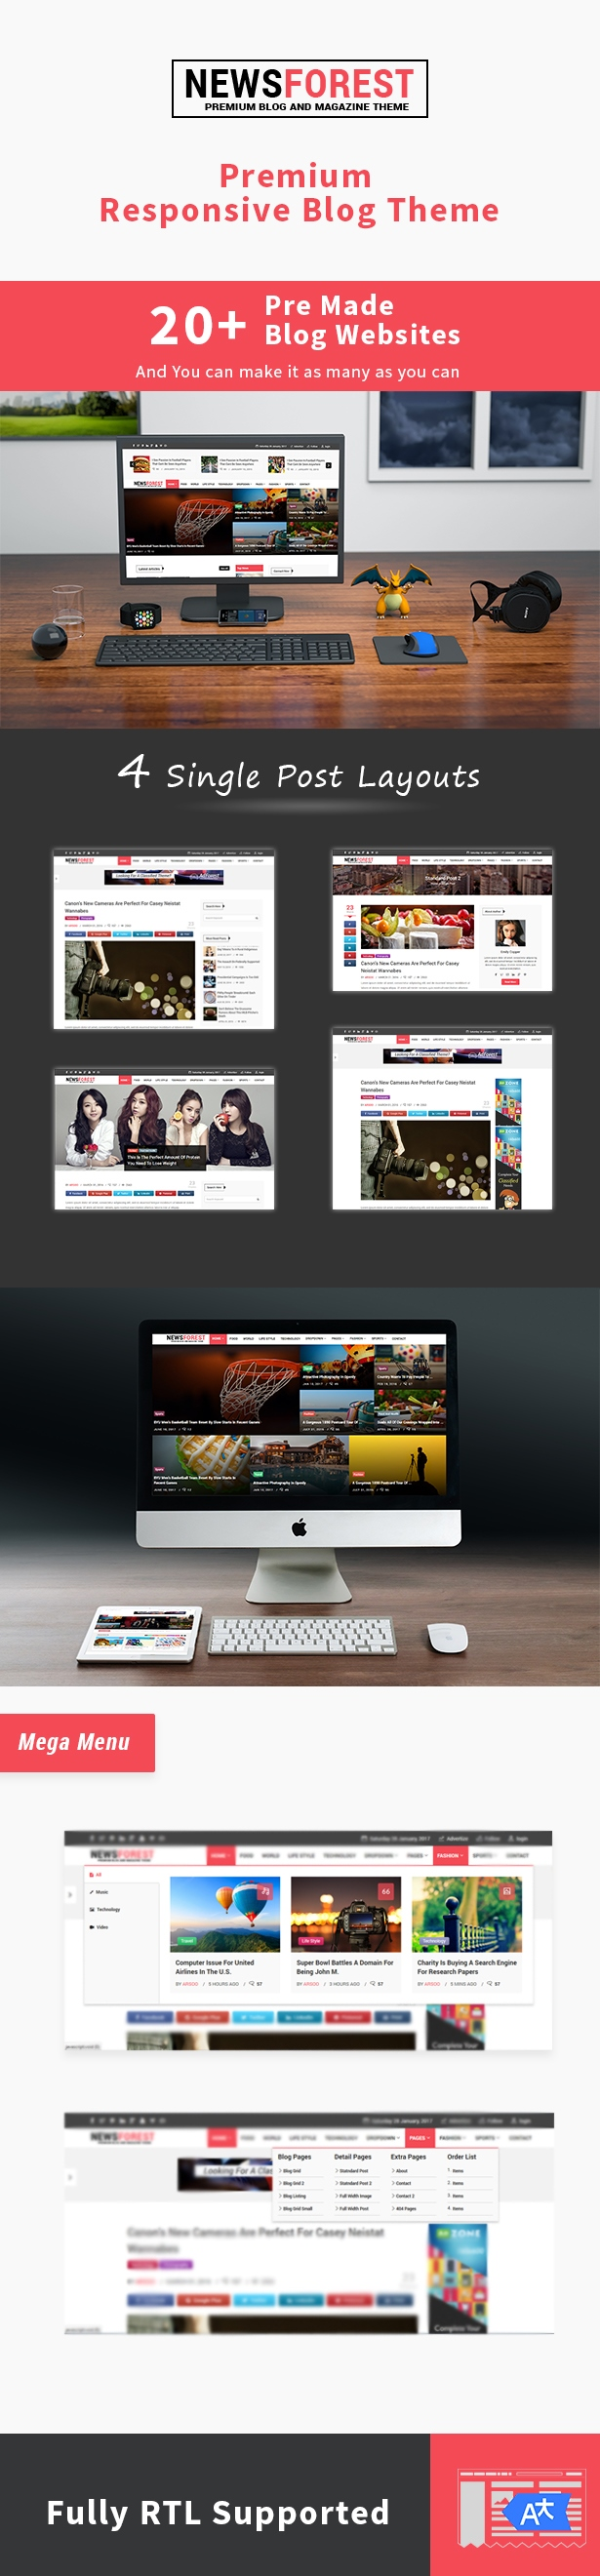 NewsForest - Magazine / Blog WordPress Theme